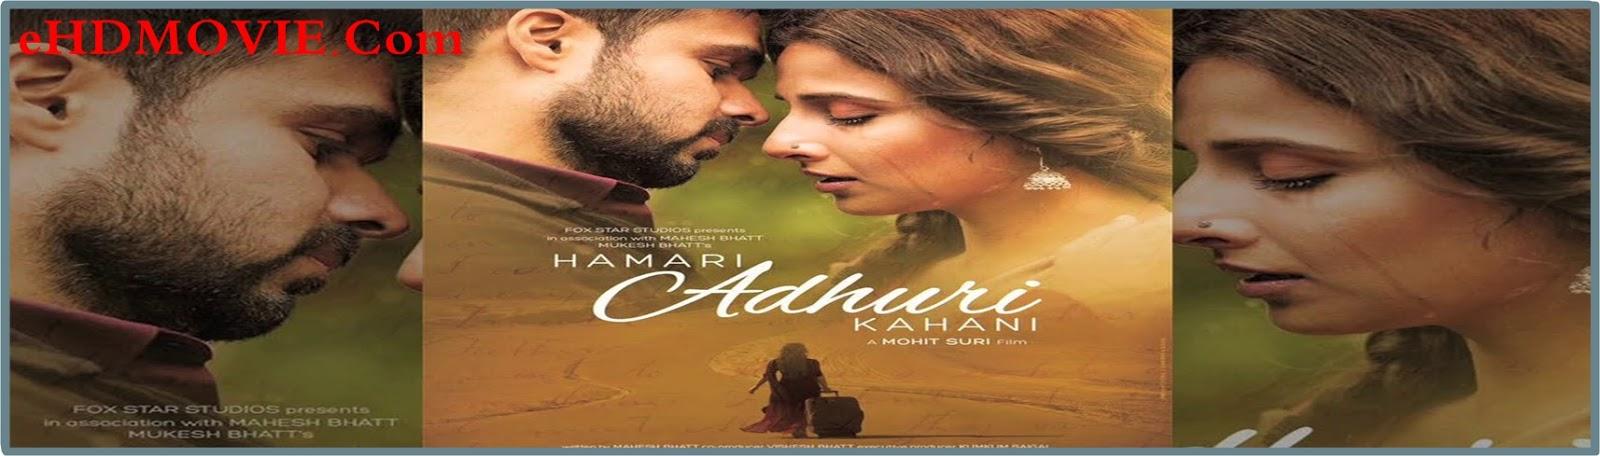 Hamari Adhuri Kahani 2015 Full Movie Hindi 720p - 480p ORG HDRip 350MB - 800MB ESubs Free Download